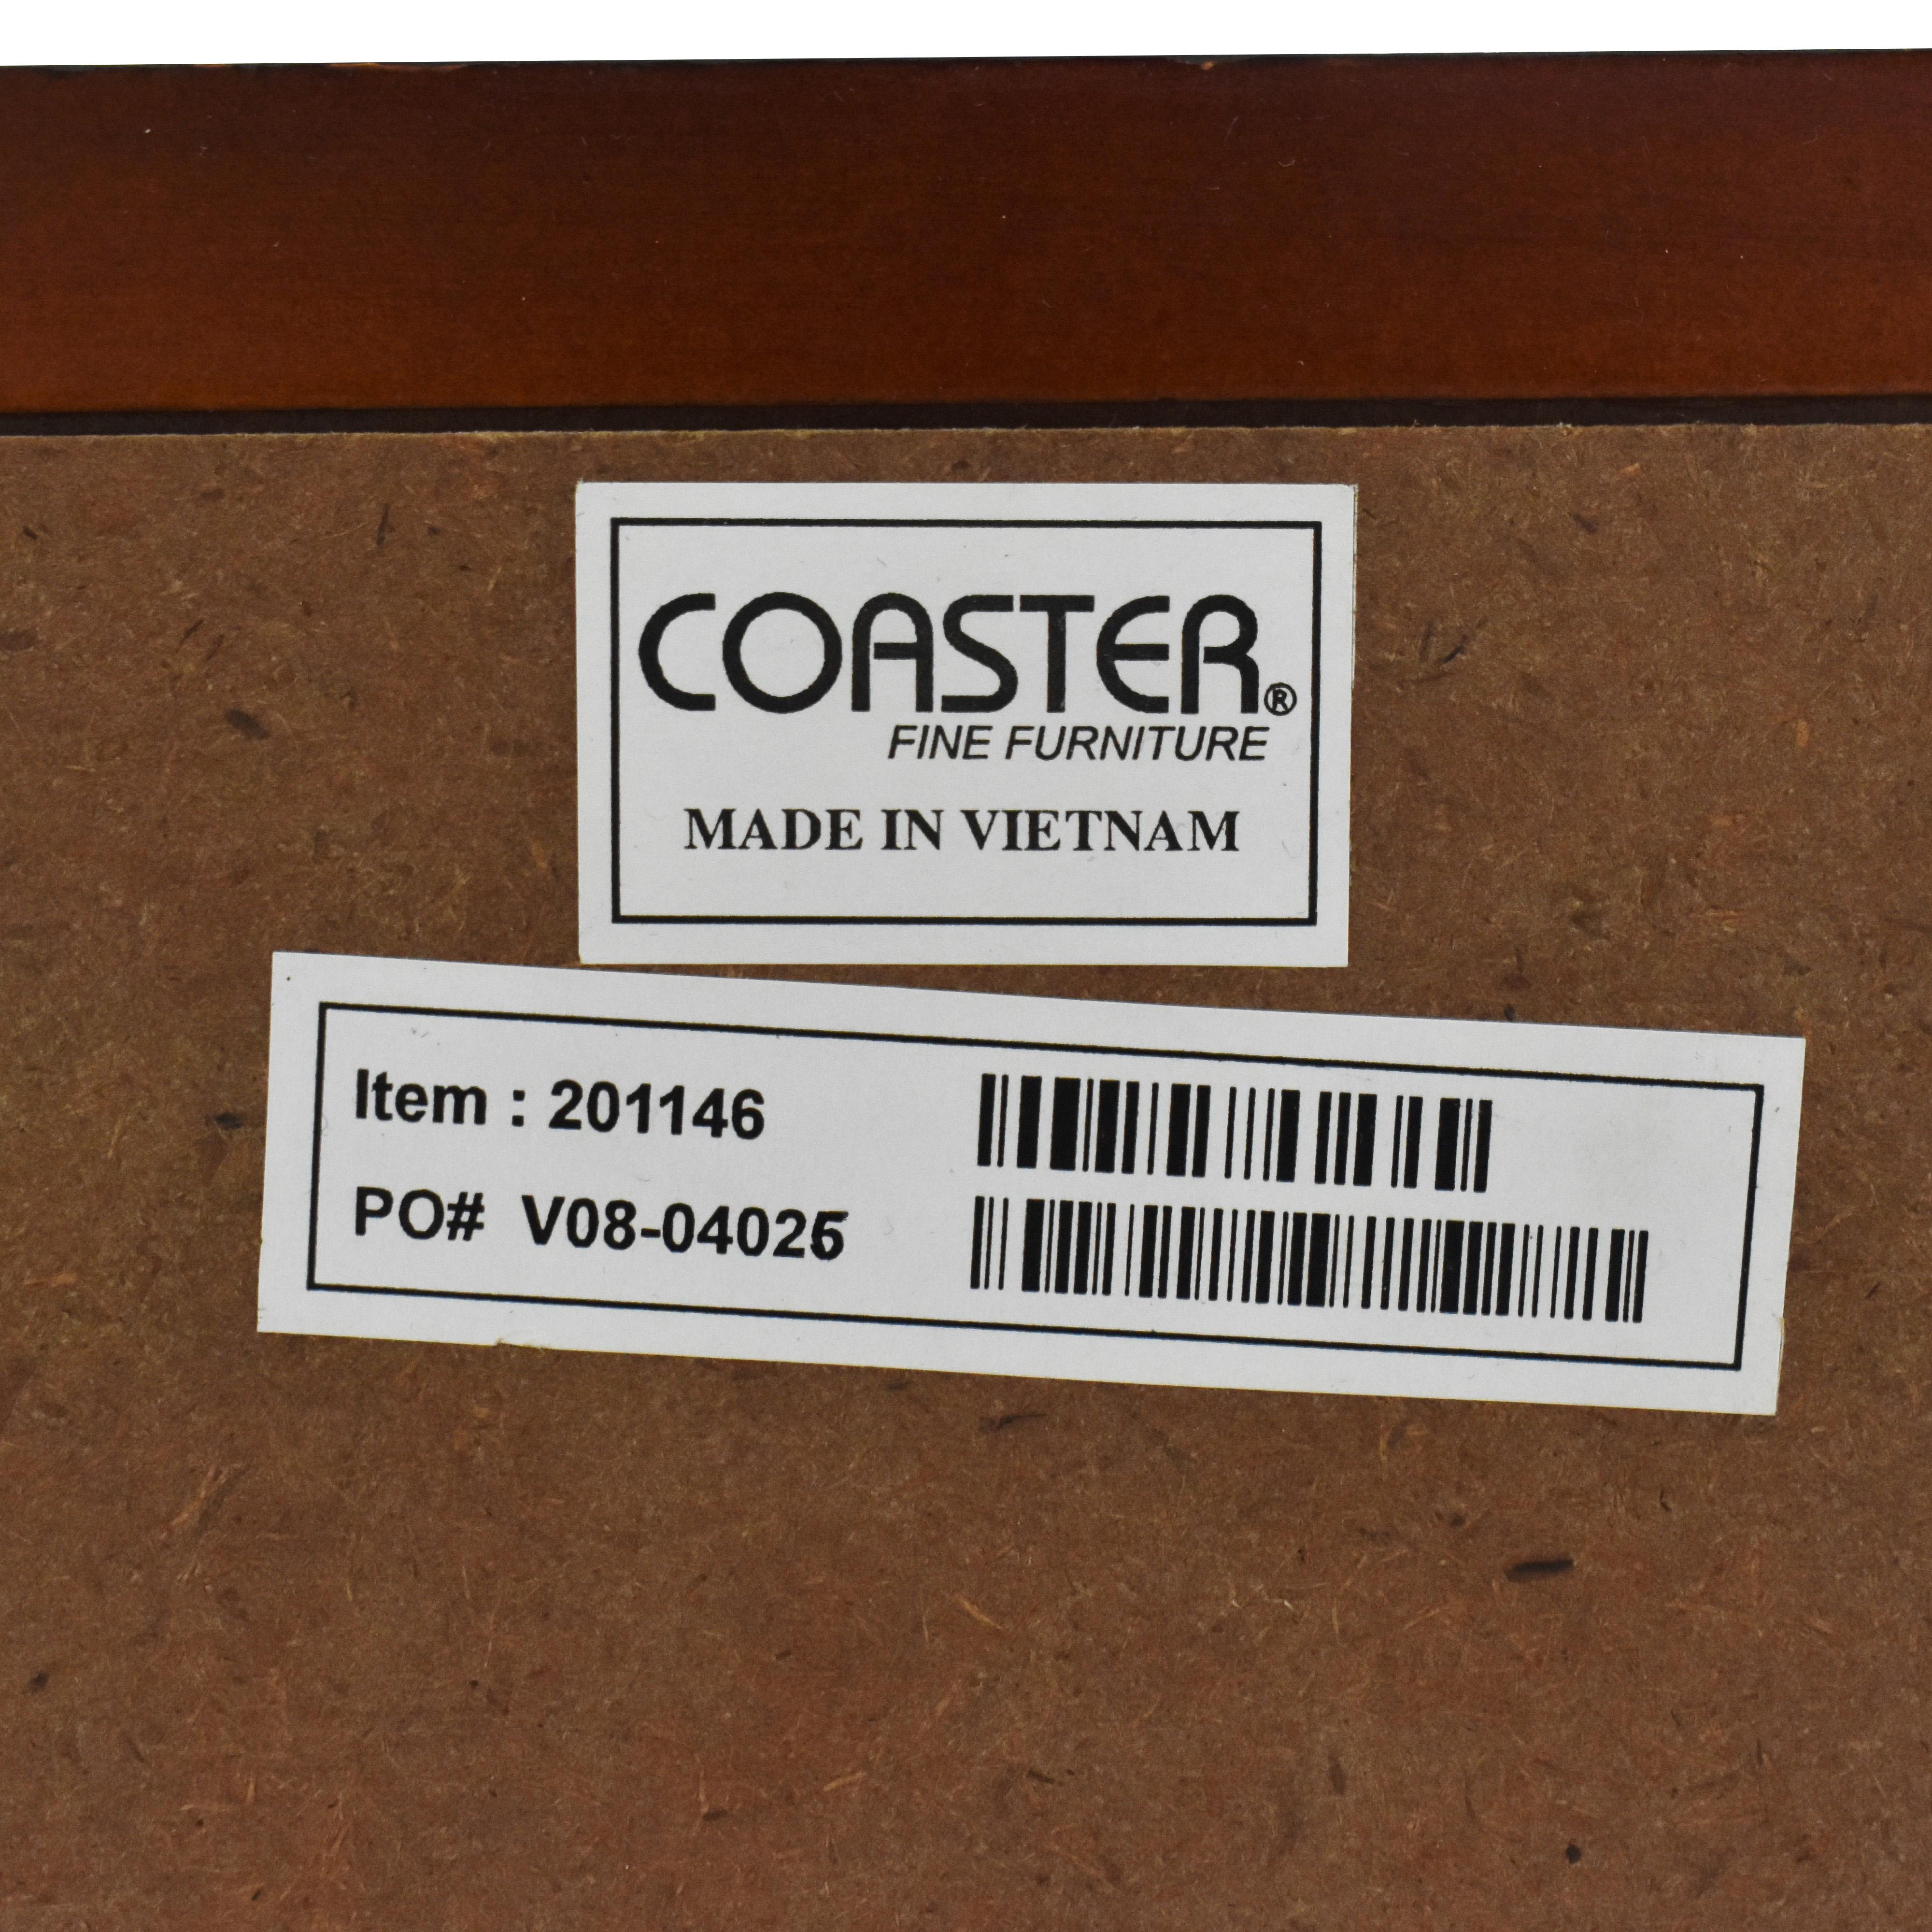 Coaster Fine Furniture Coaster Seven Drawer Dresser price